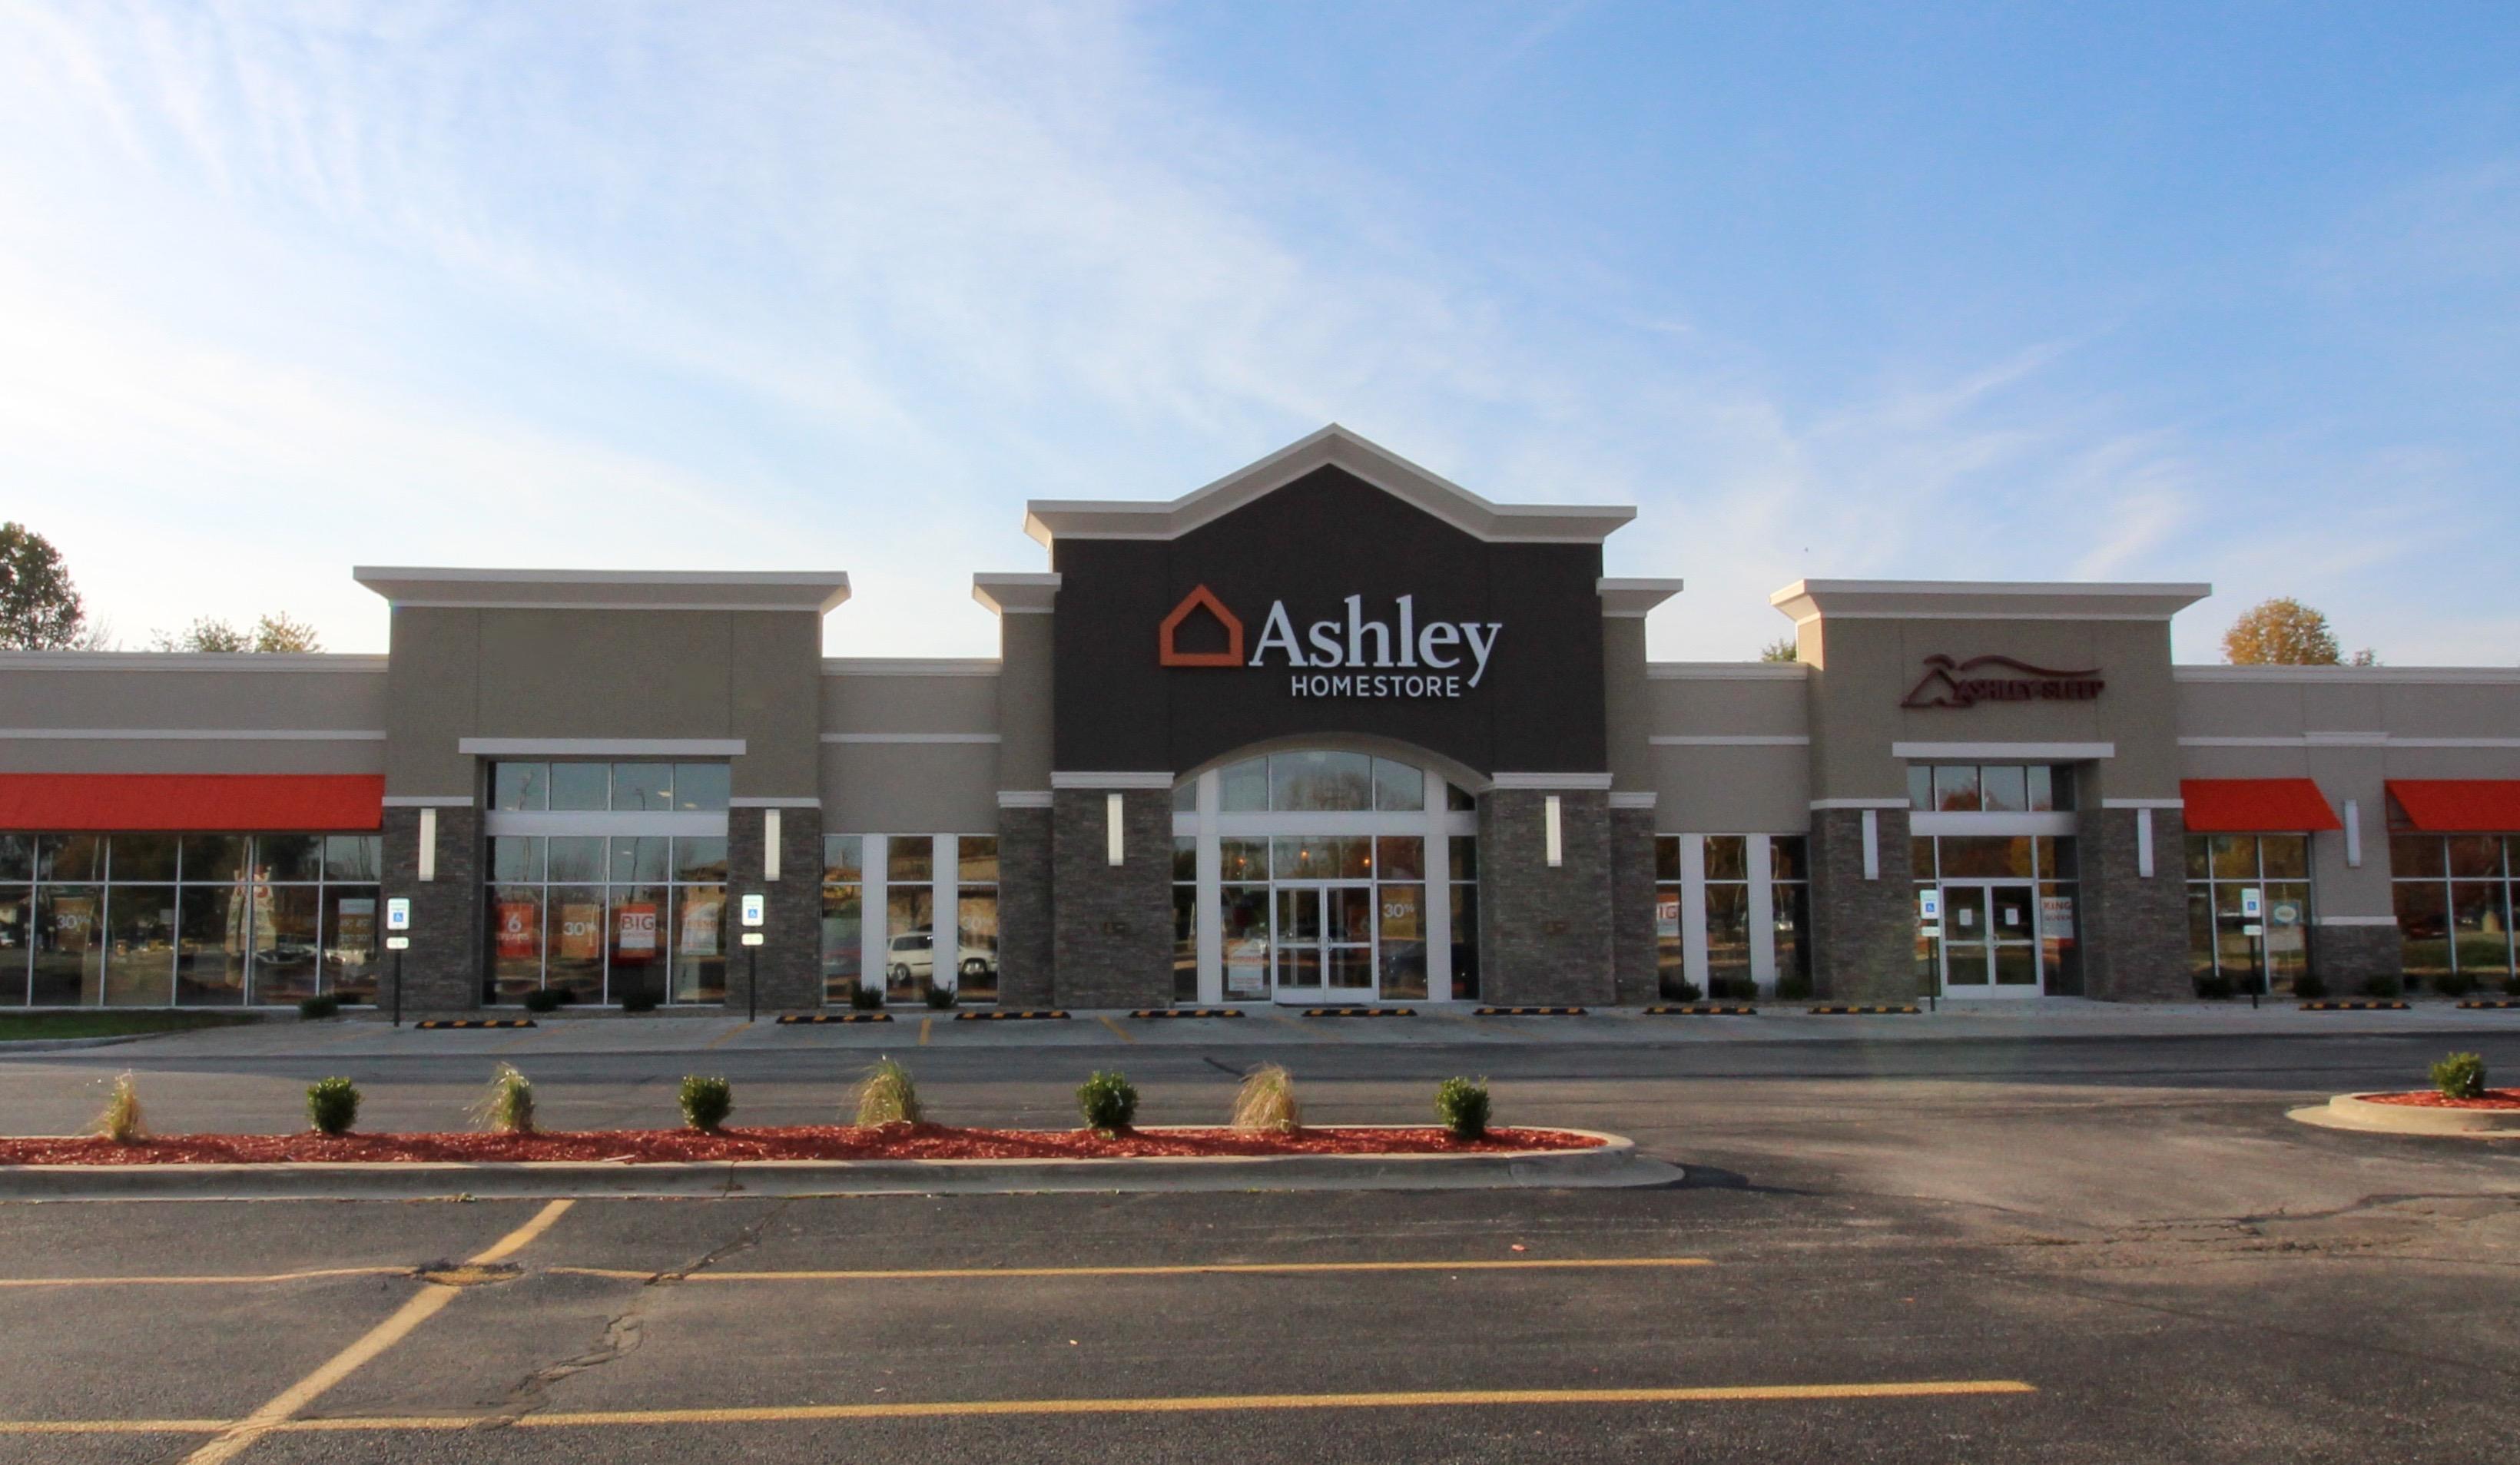 ashley furniture stores. Ashley Homestore Furniture Stores